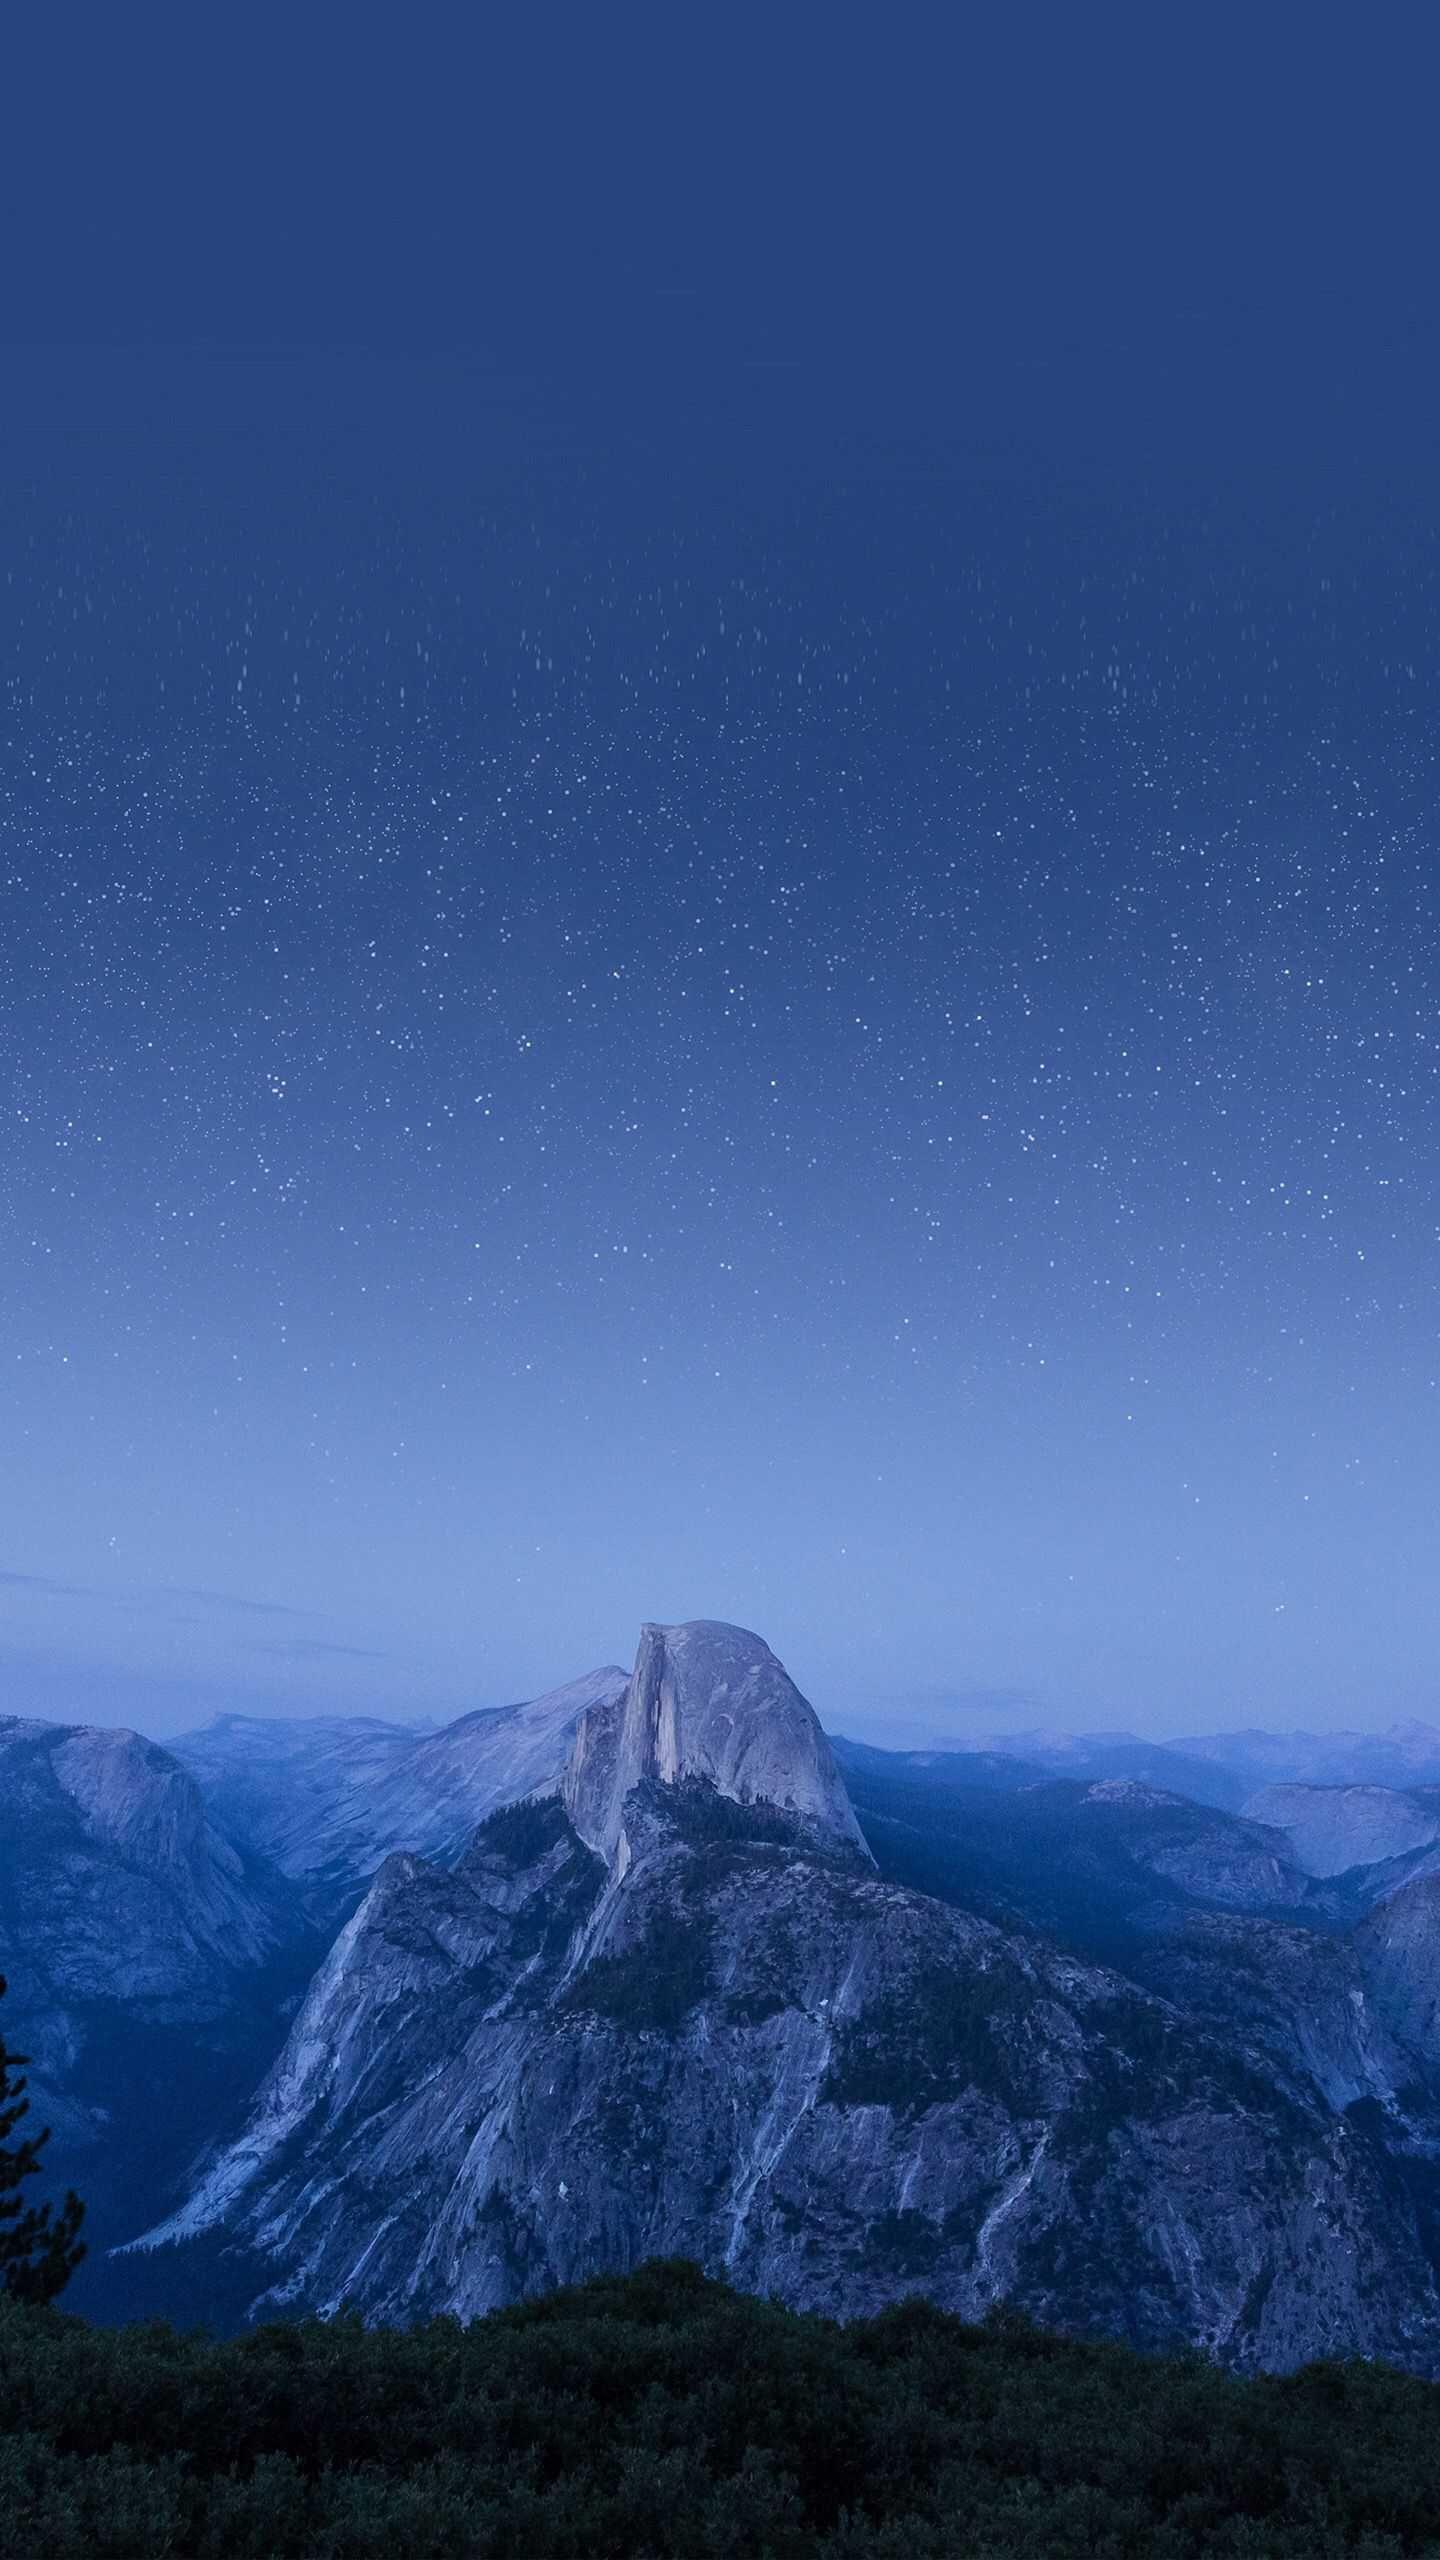 Yosemite Mountain Night Stars Iphone Wallpaper Yosemite Mountains Yosemite Wallpaper Iphone 6s Wallpaper